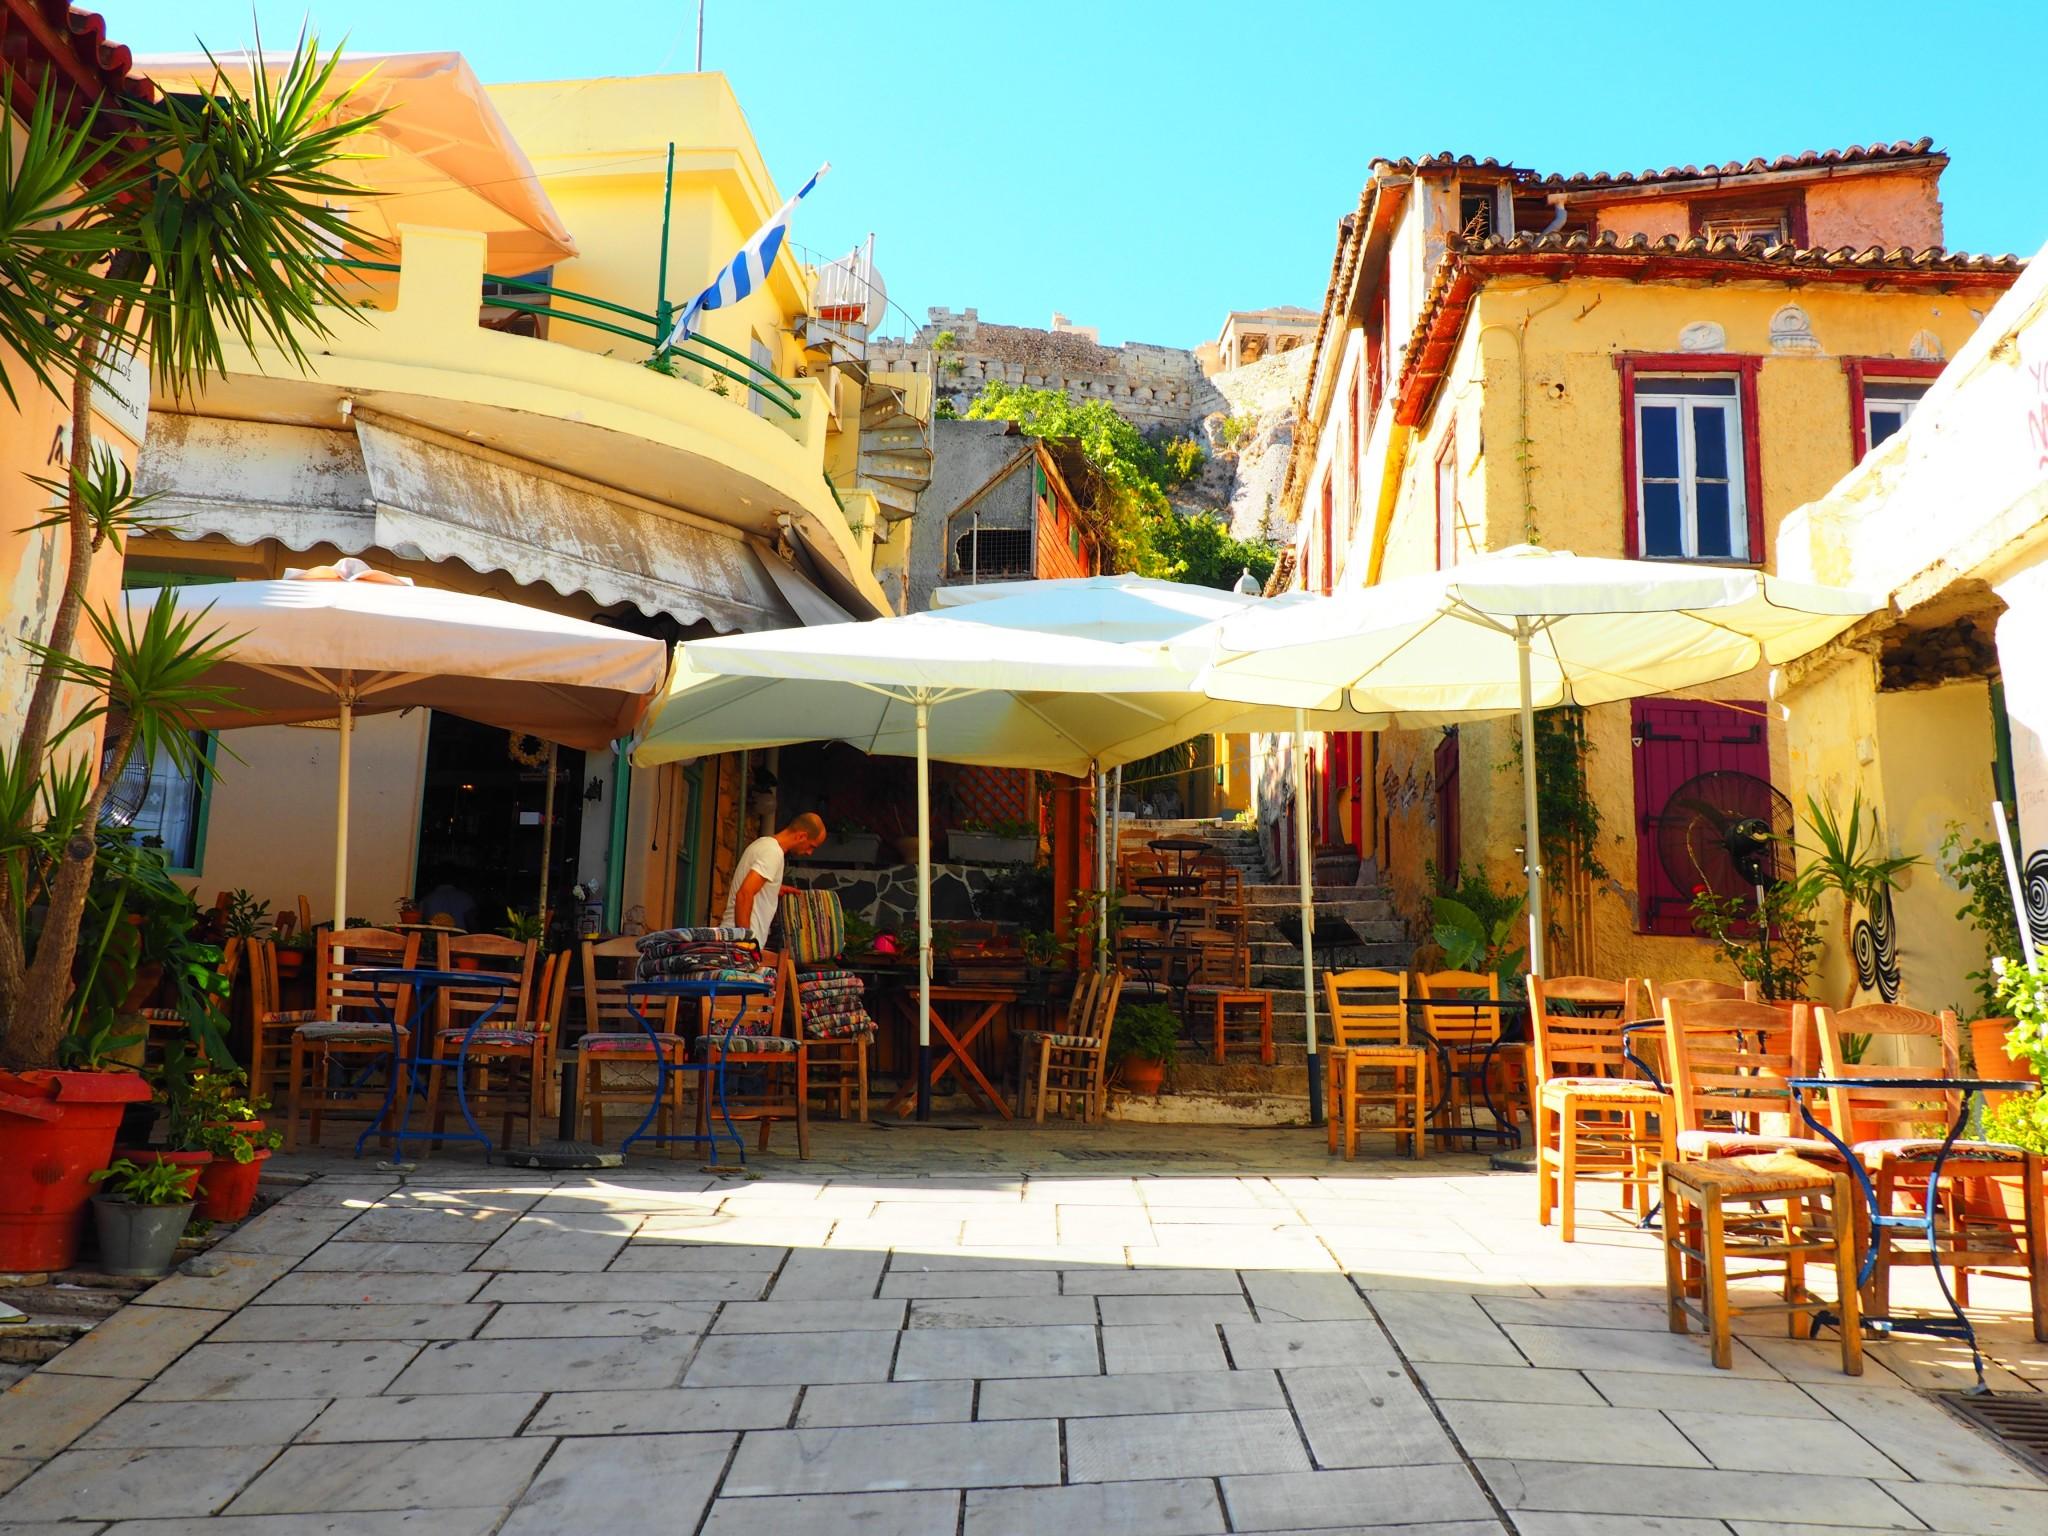 Athens Travel Guide letsregale.com 14